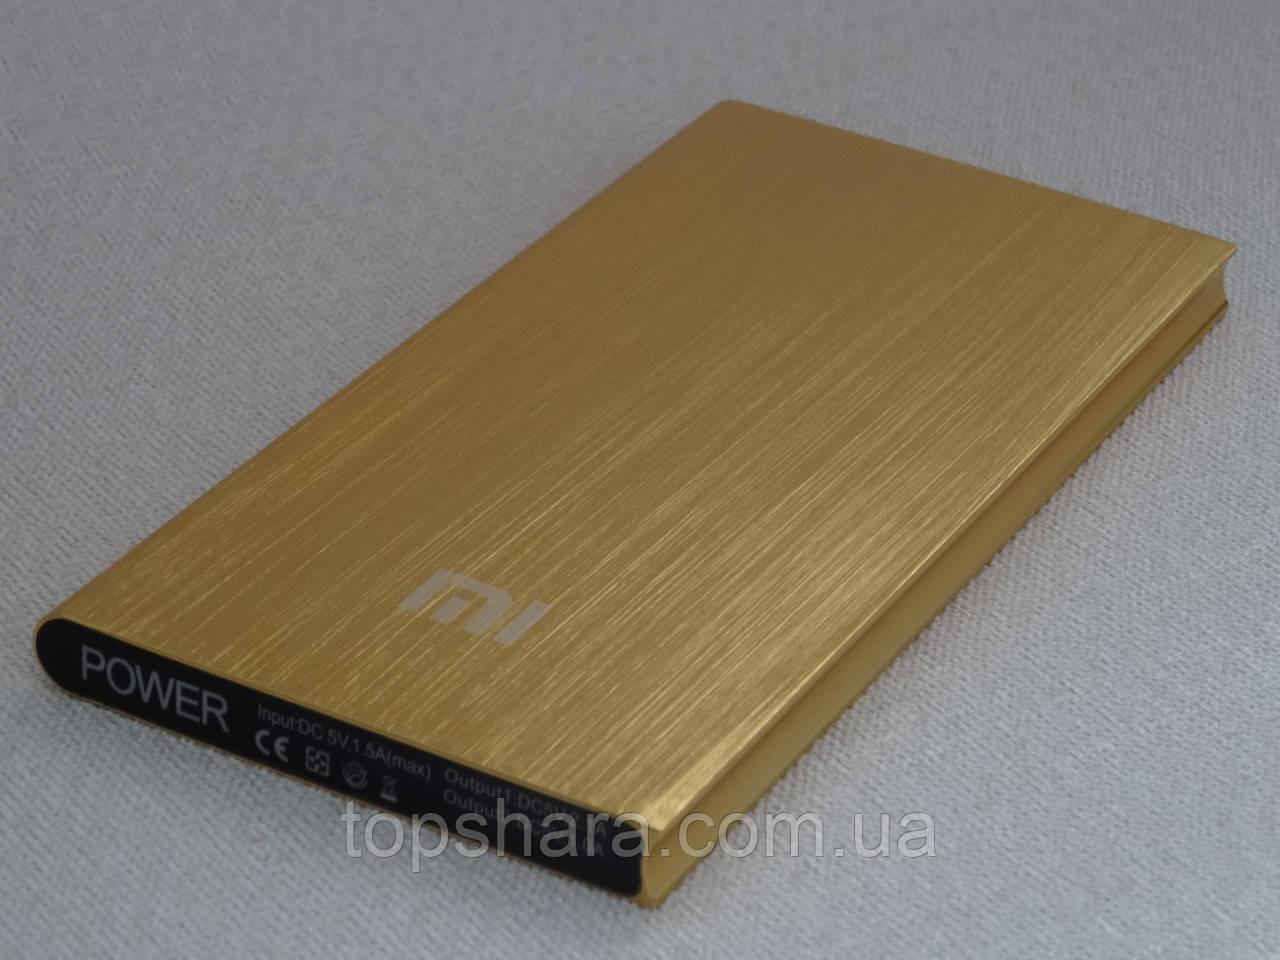 Внешний аккумулятор Power Bank Xiaomi Mi 28000 mAh золото